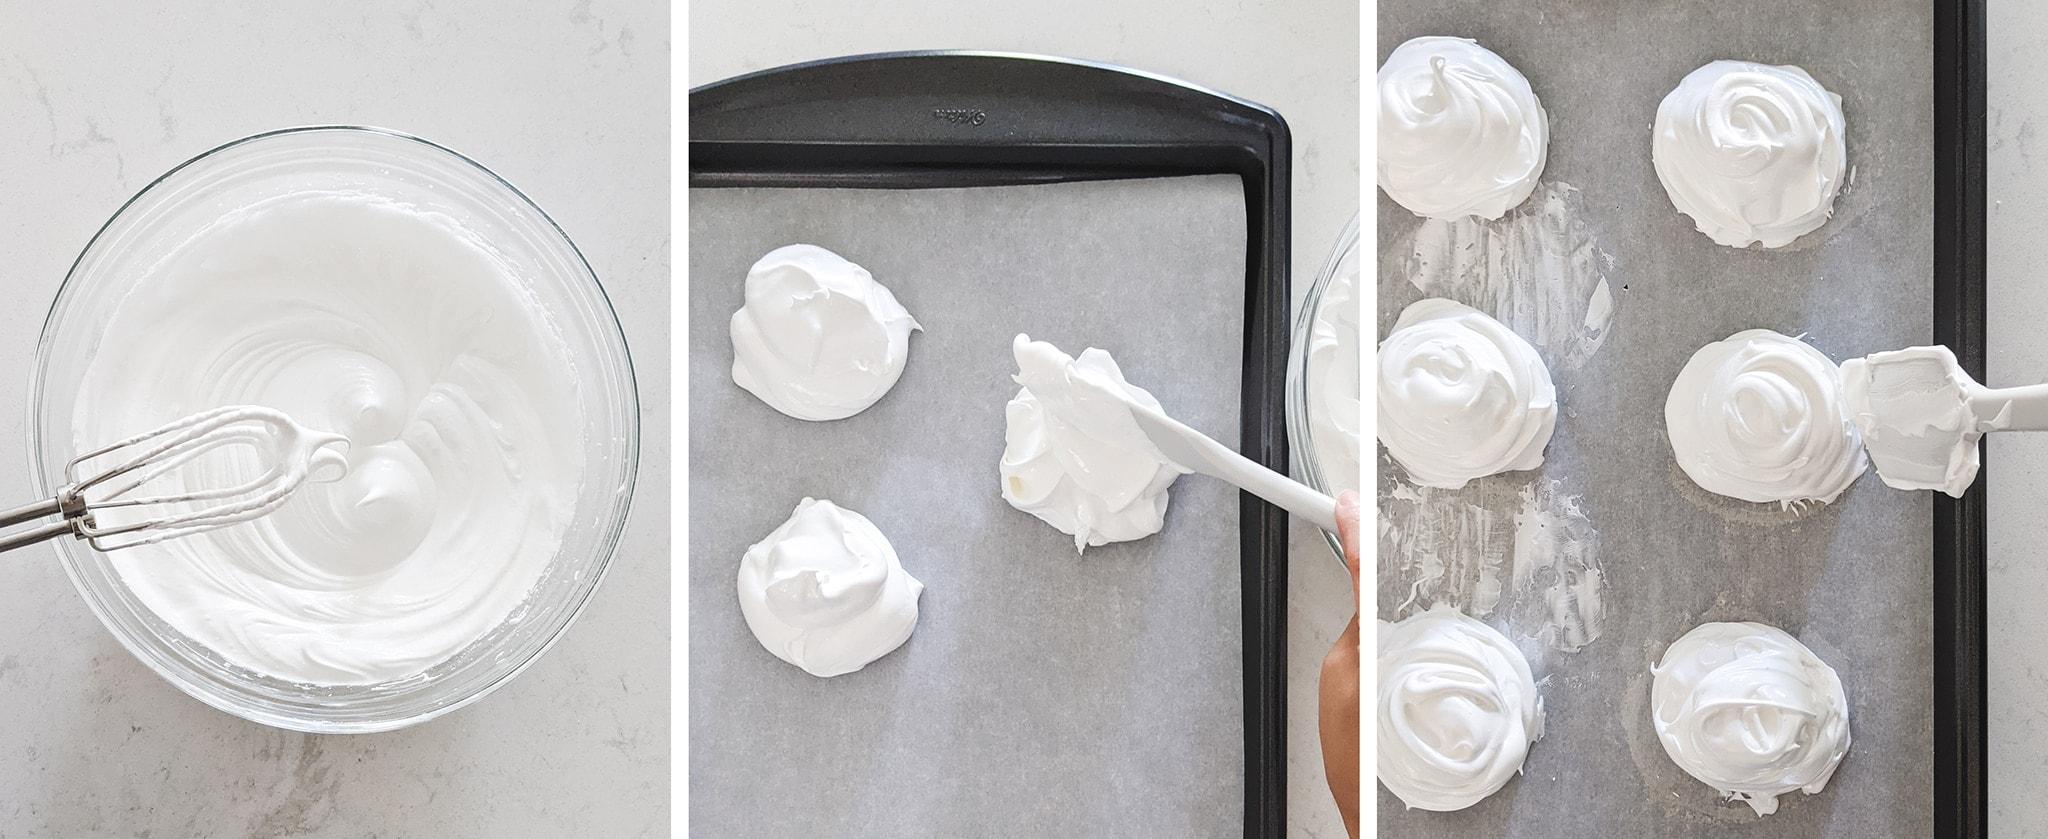 Shaping mounds of meringue on baking sheet